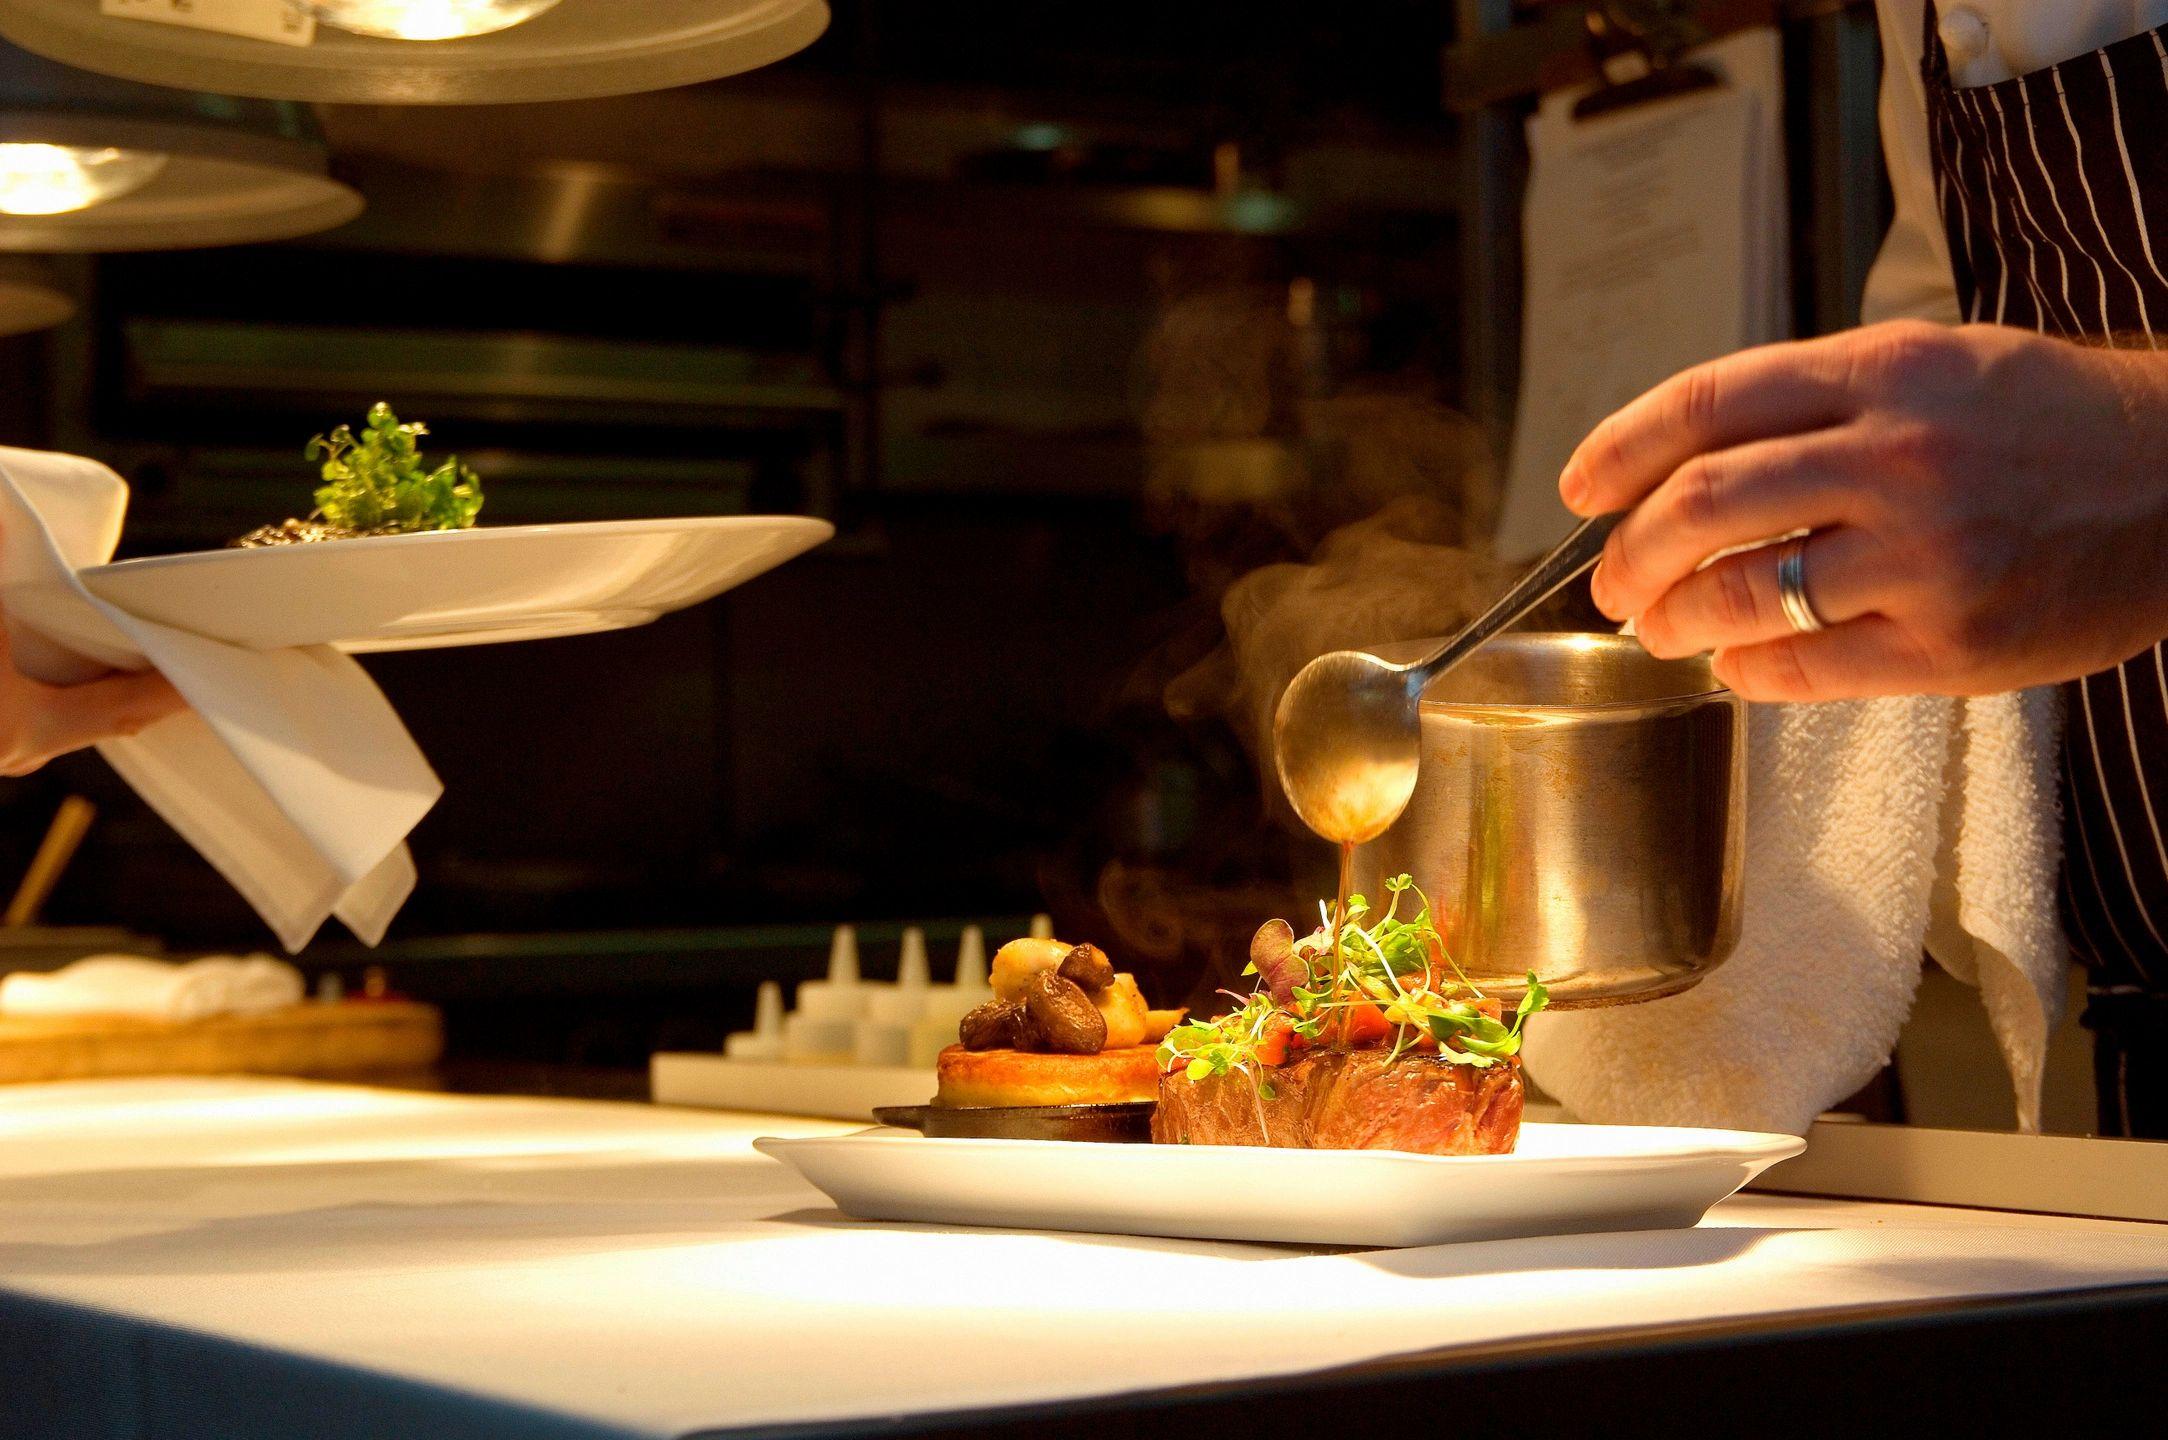 Botanica Cuisine By Dag Demarkow Co Dinner Food Restaurant